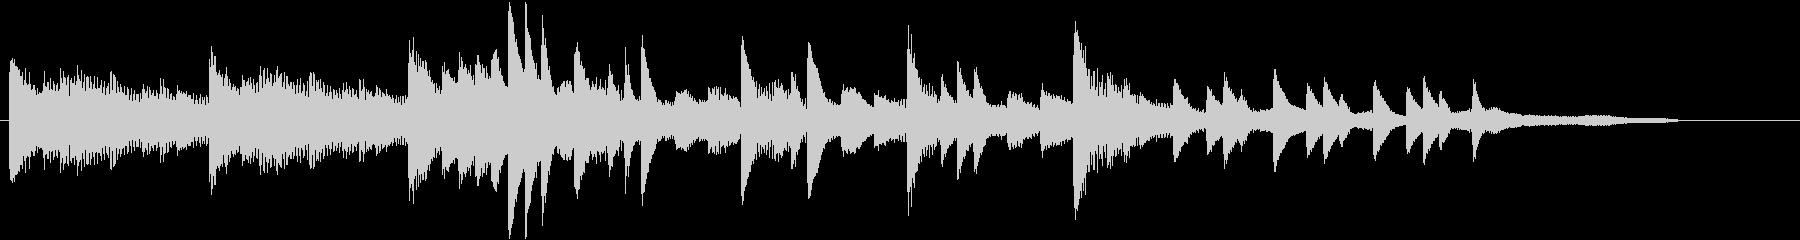 XmasキャロルオブザベルズジングルCの未再生の波形